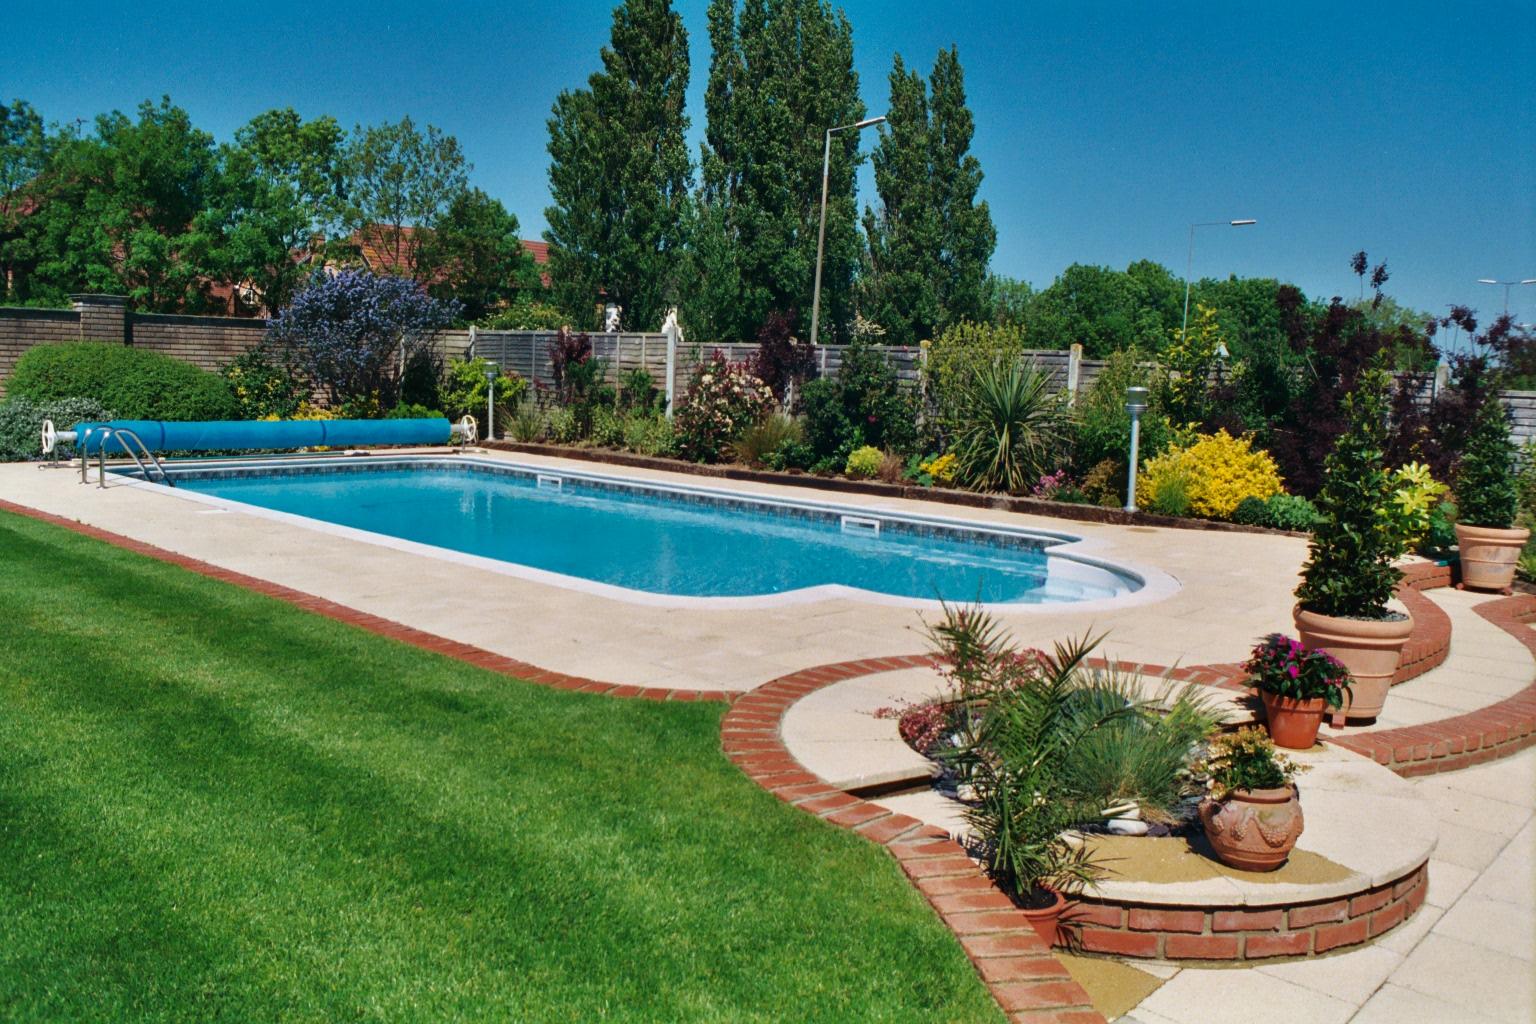 Super Inground Family Pool.JPG